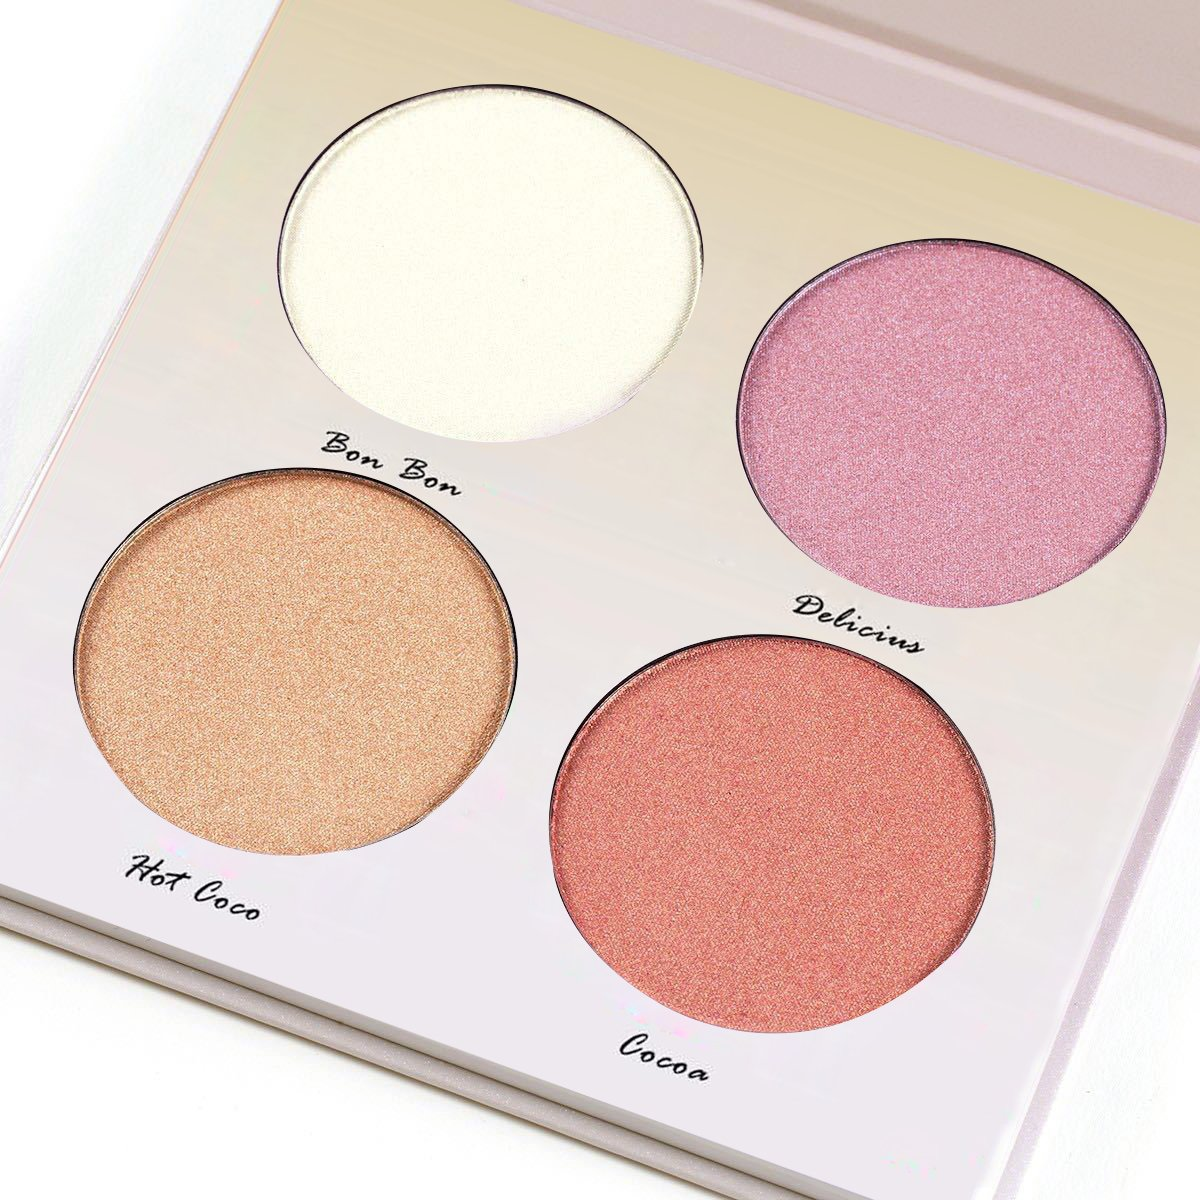 Aurelife Go Glow -- 4 Color Makeup Llluminator Highlighter & Bronzer Collection Glow Kit Matte Face Palette